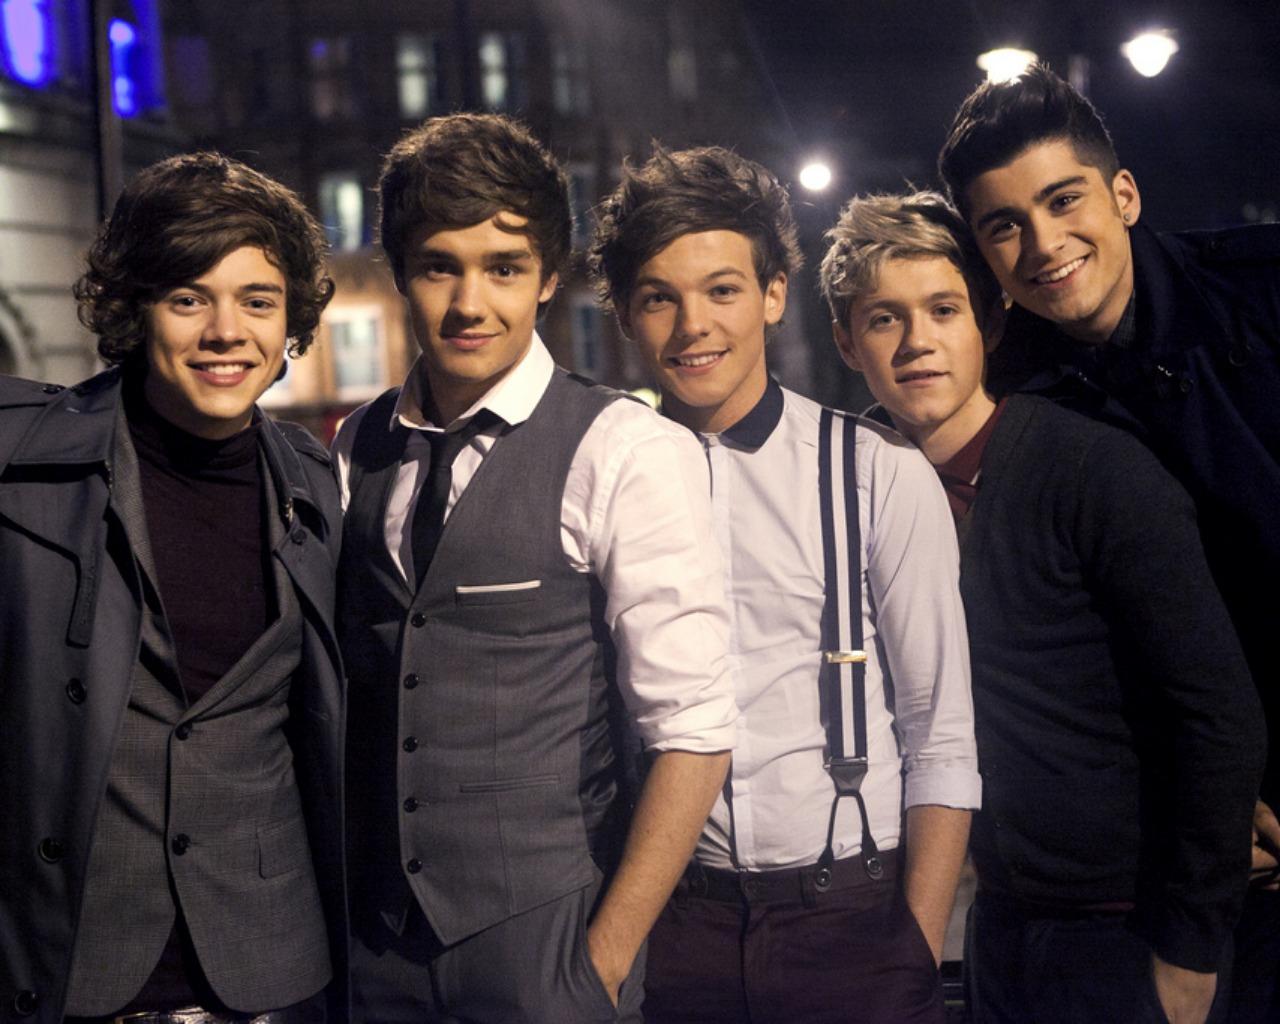 Story of My Life One Direction Testo e Accordi per Chitarra